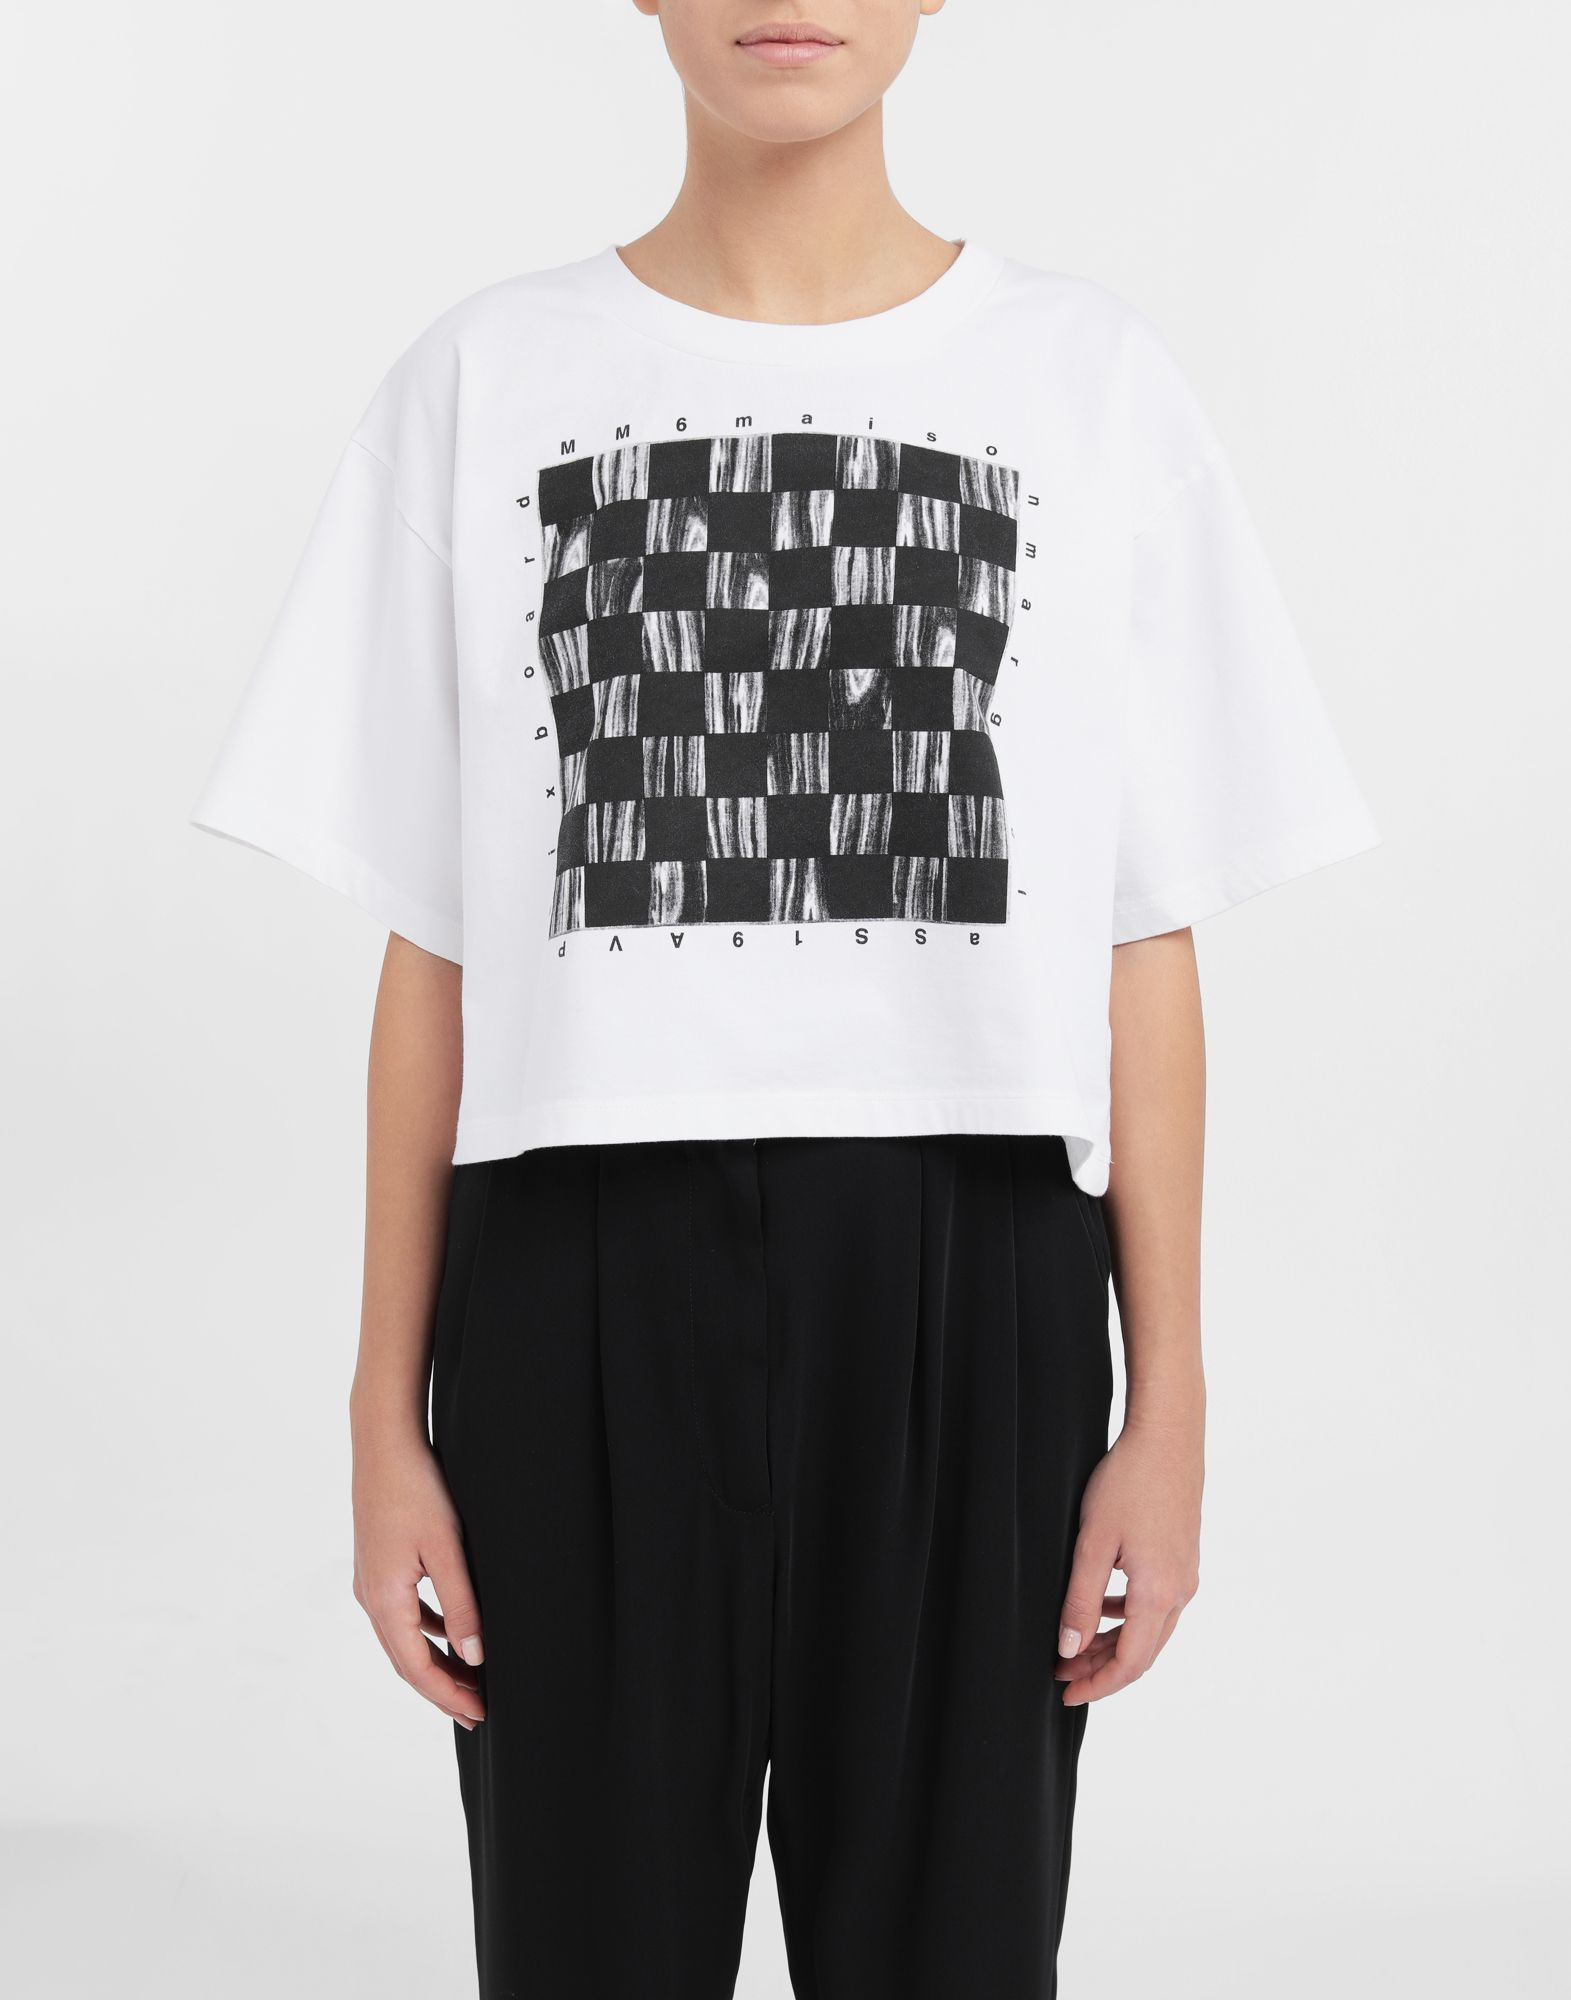 MM6 MAISON MARGIELA Board games print T-shirt Short sleeve t-shirt Woman r